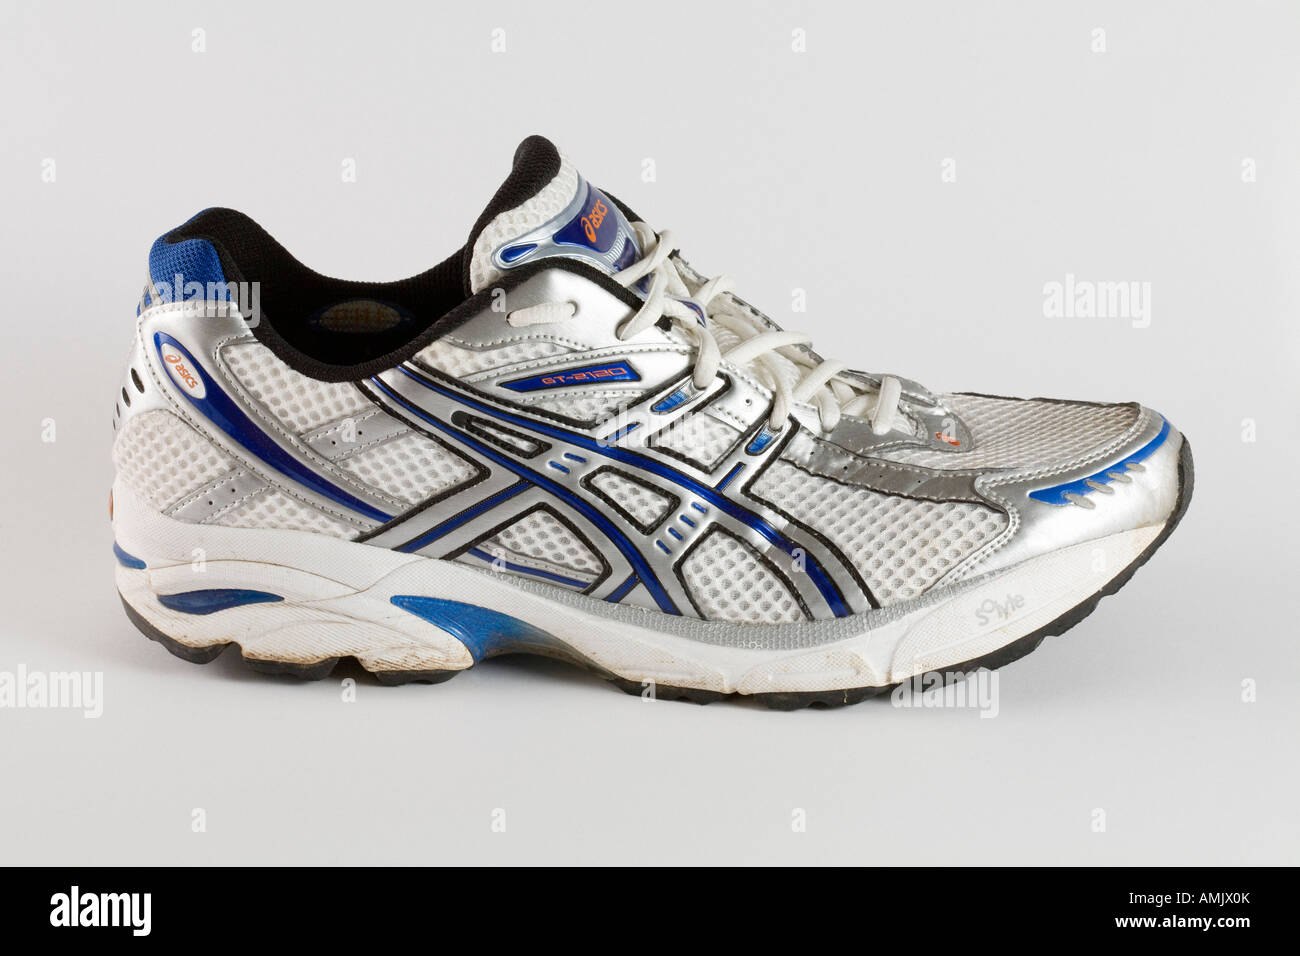 Asics GT 2120 running training shoe